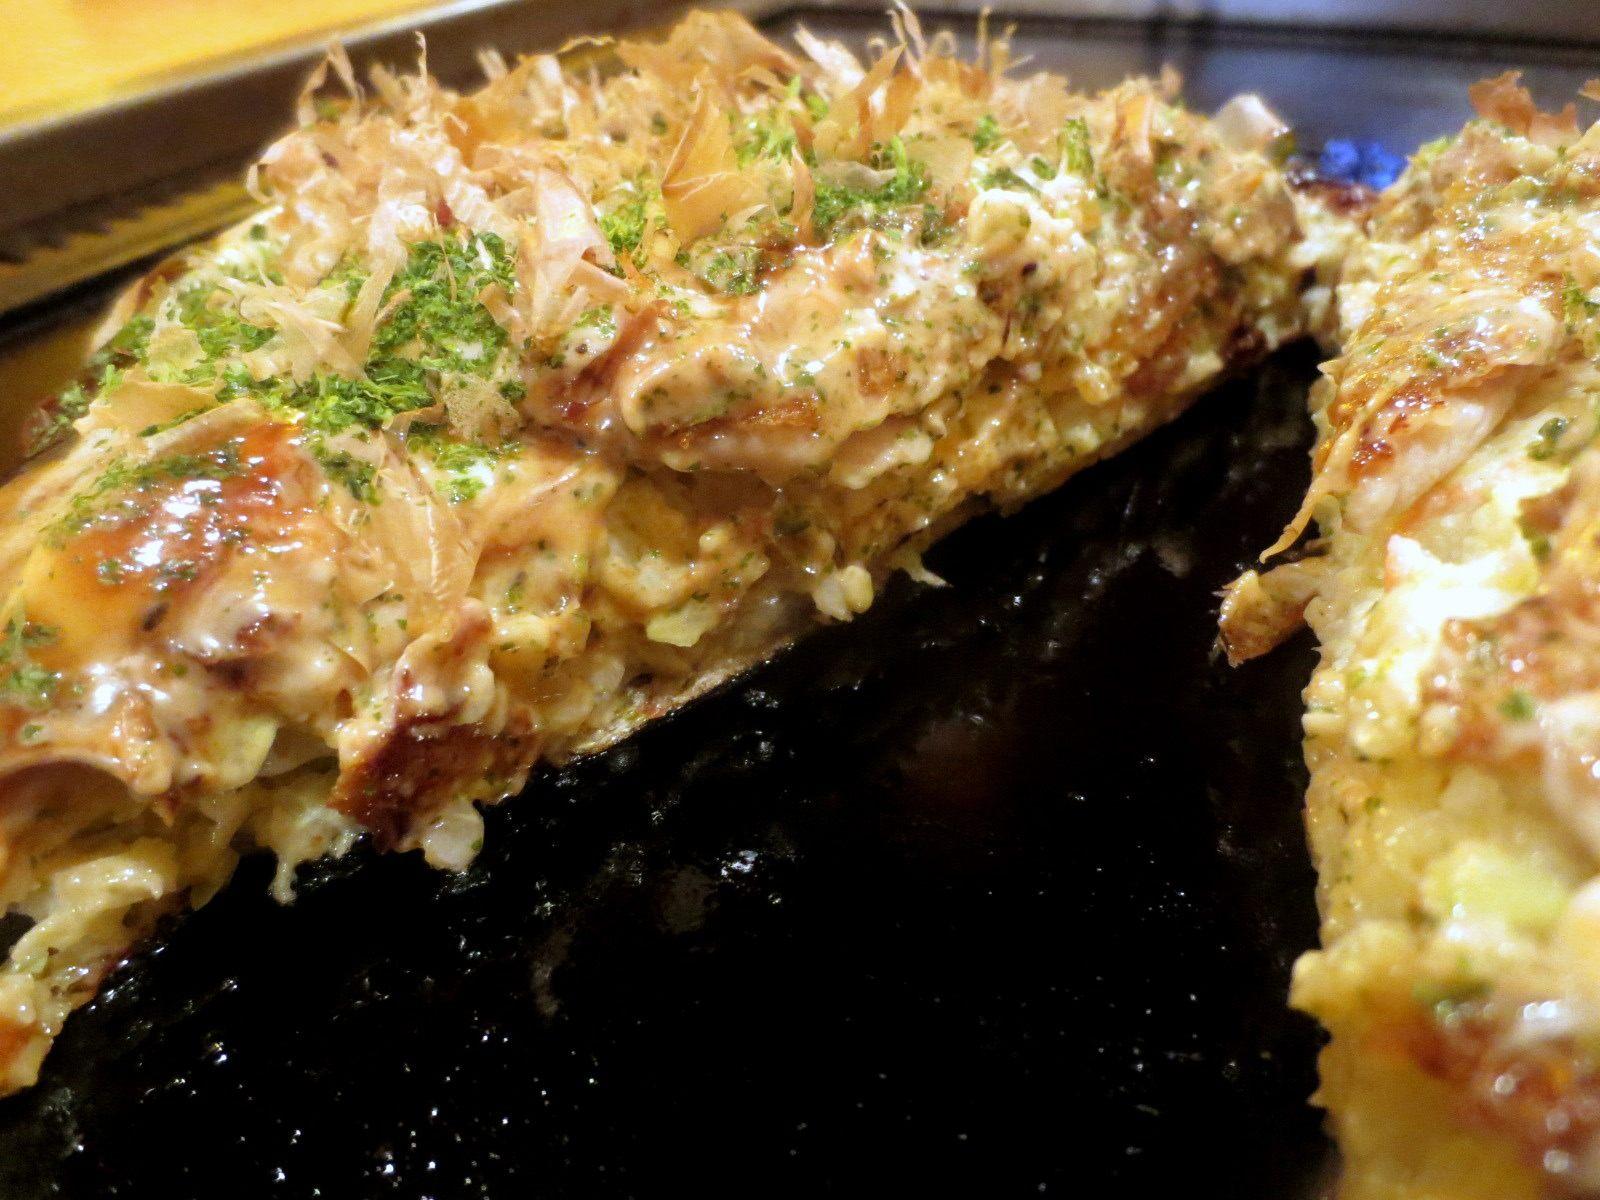 A Cross-section of the Okonomiyaki